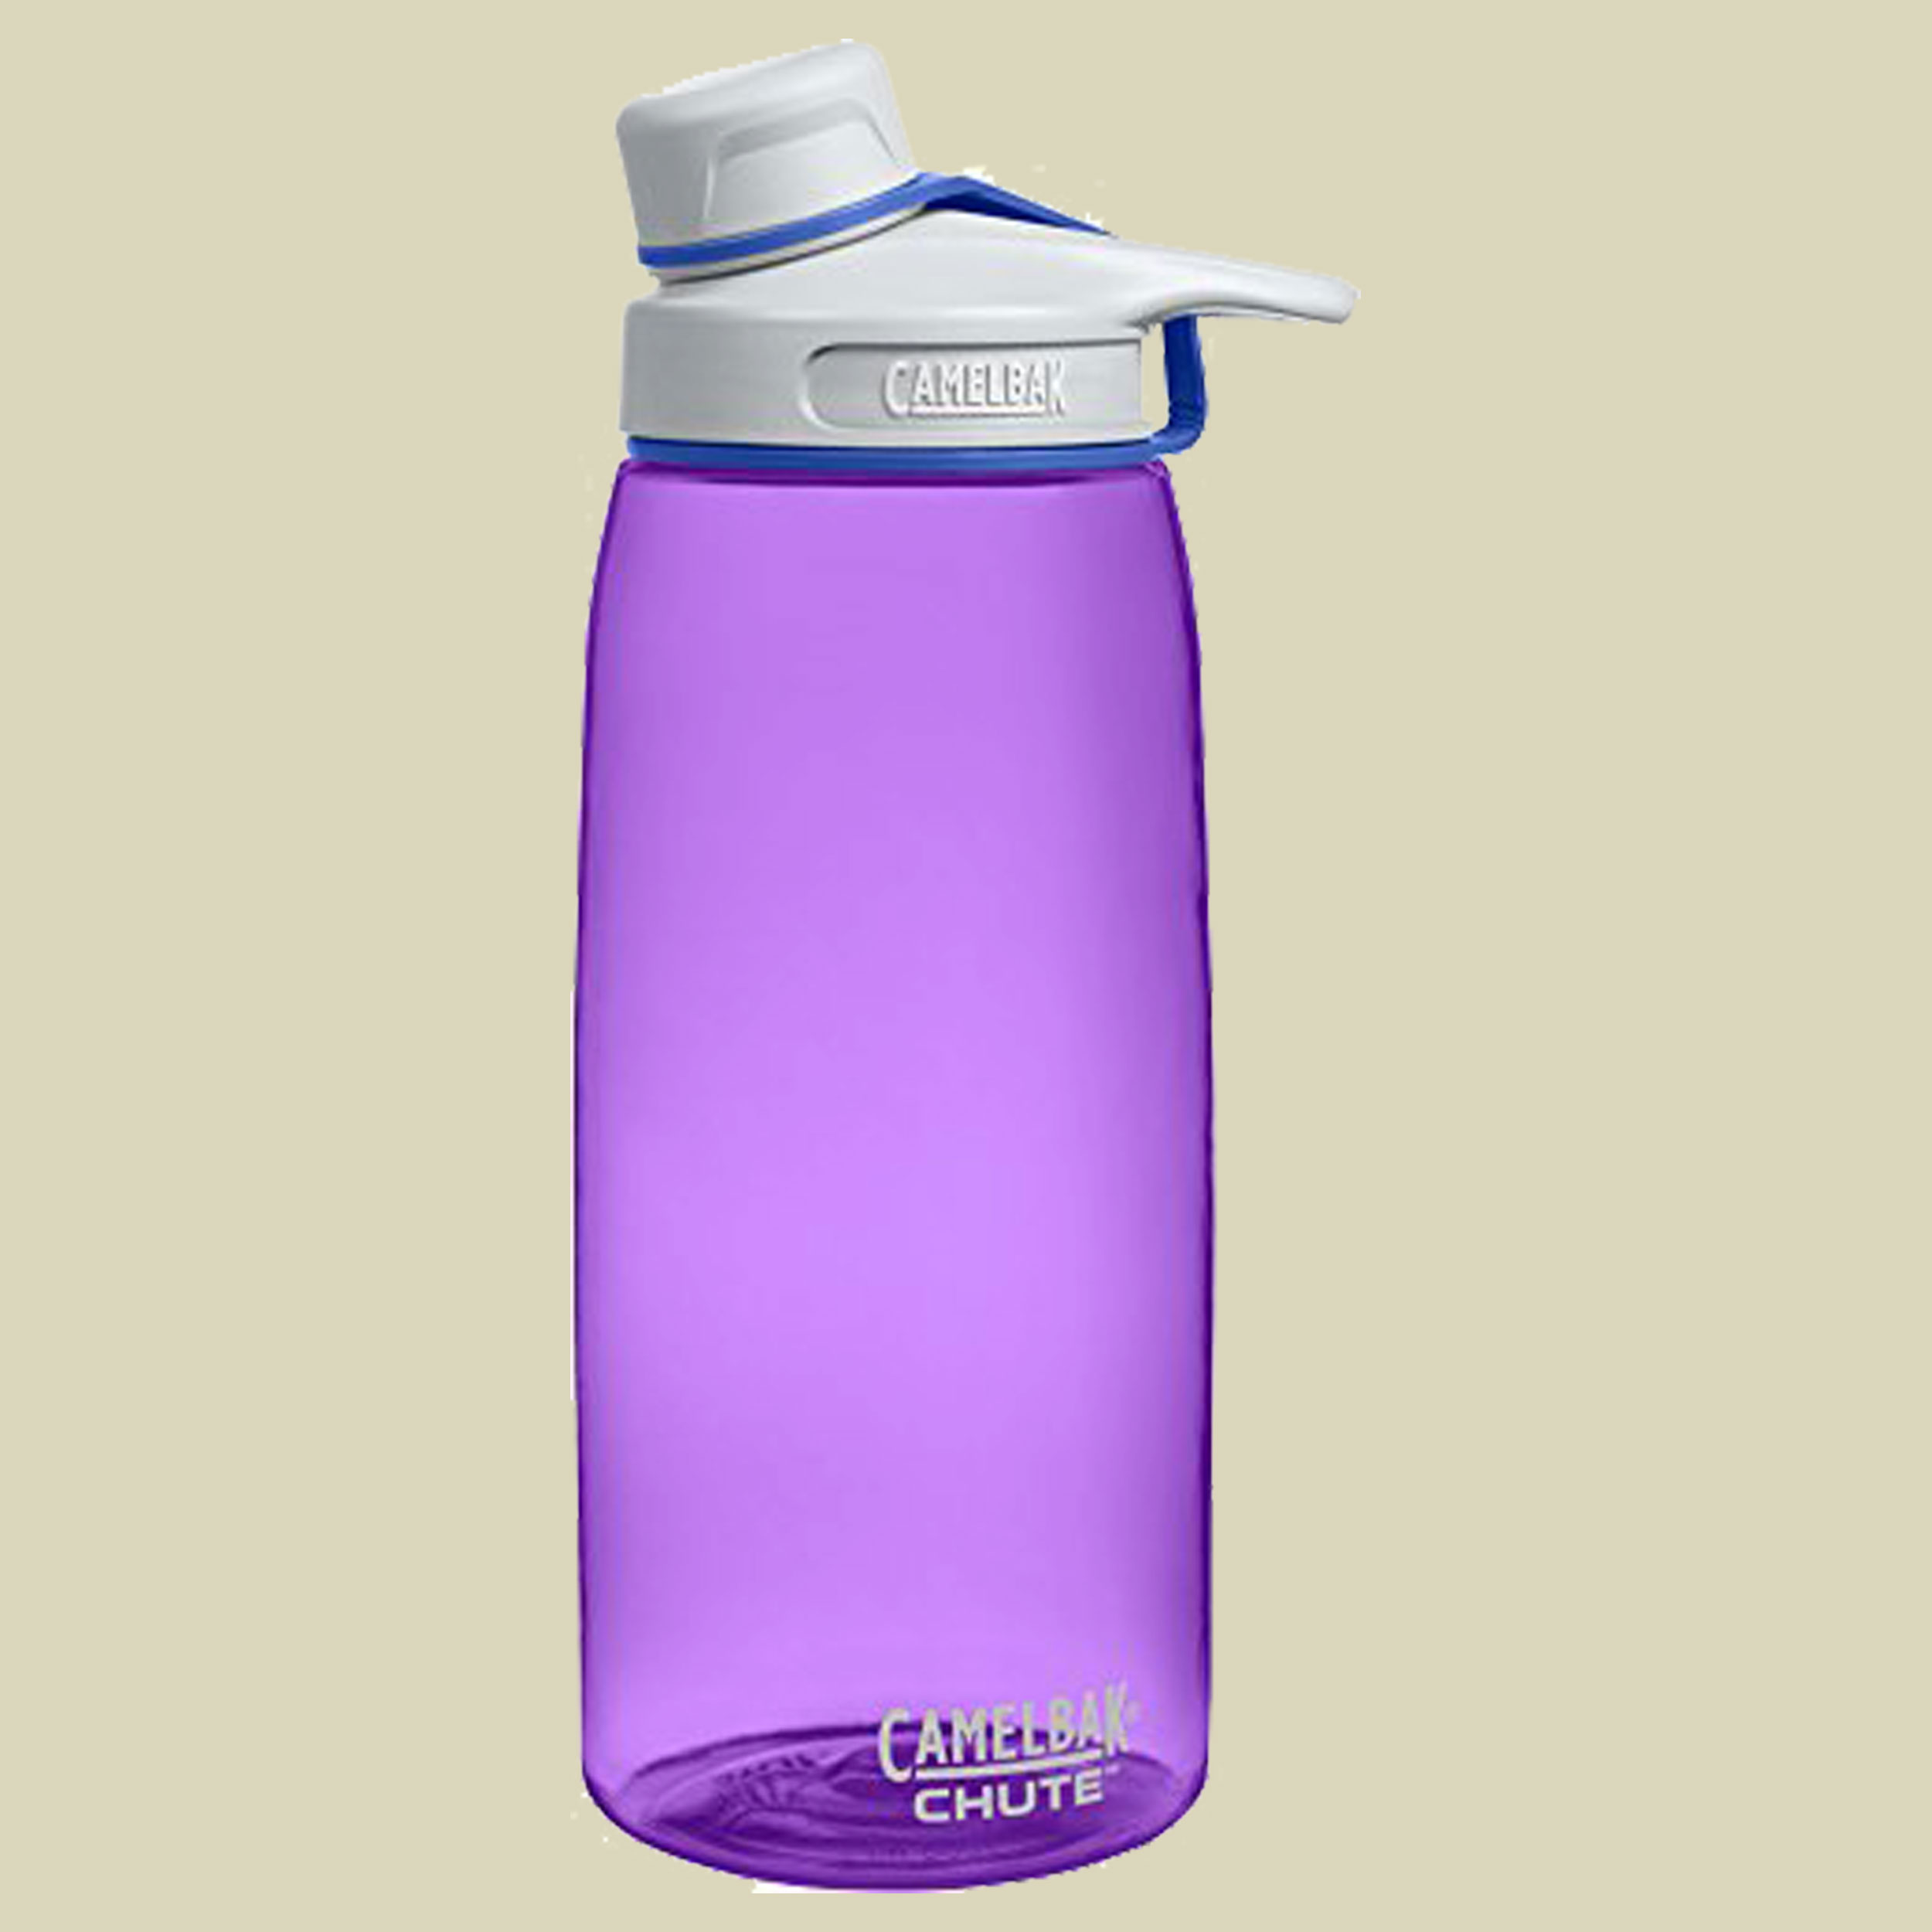 Camelbak Chute™ 1 L Trinkflasche Volumen 1,0 lotus